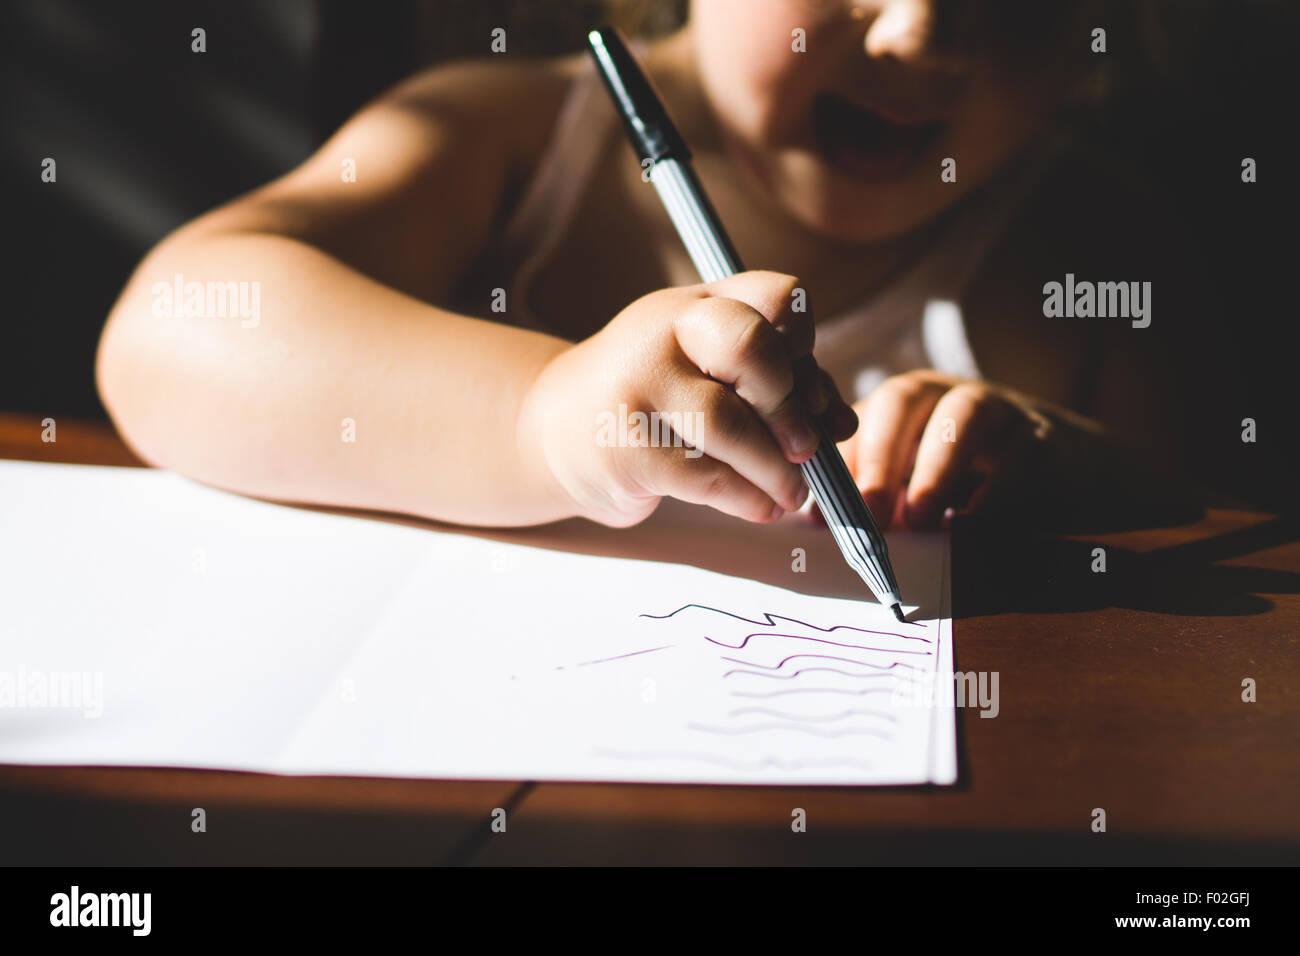 Close-up de una niña dibujo Imagen De Stock